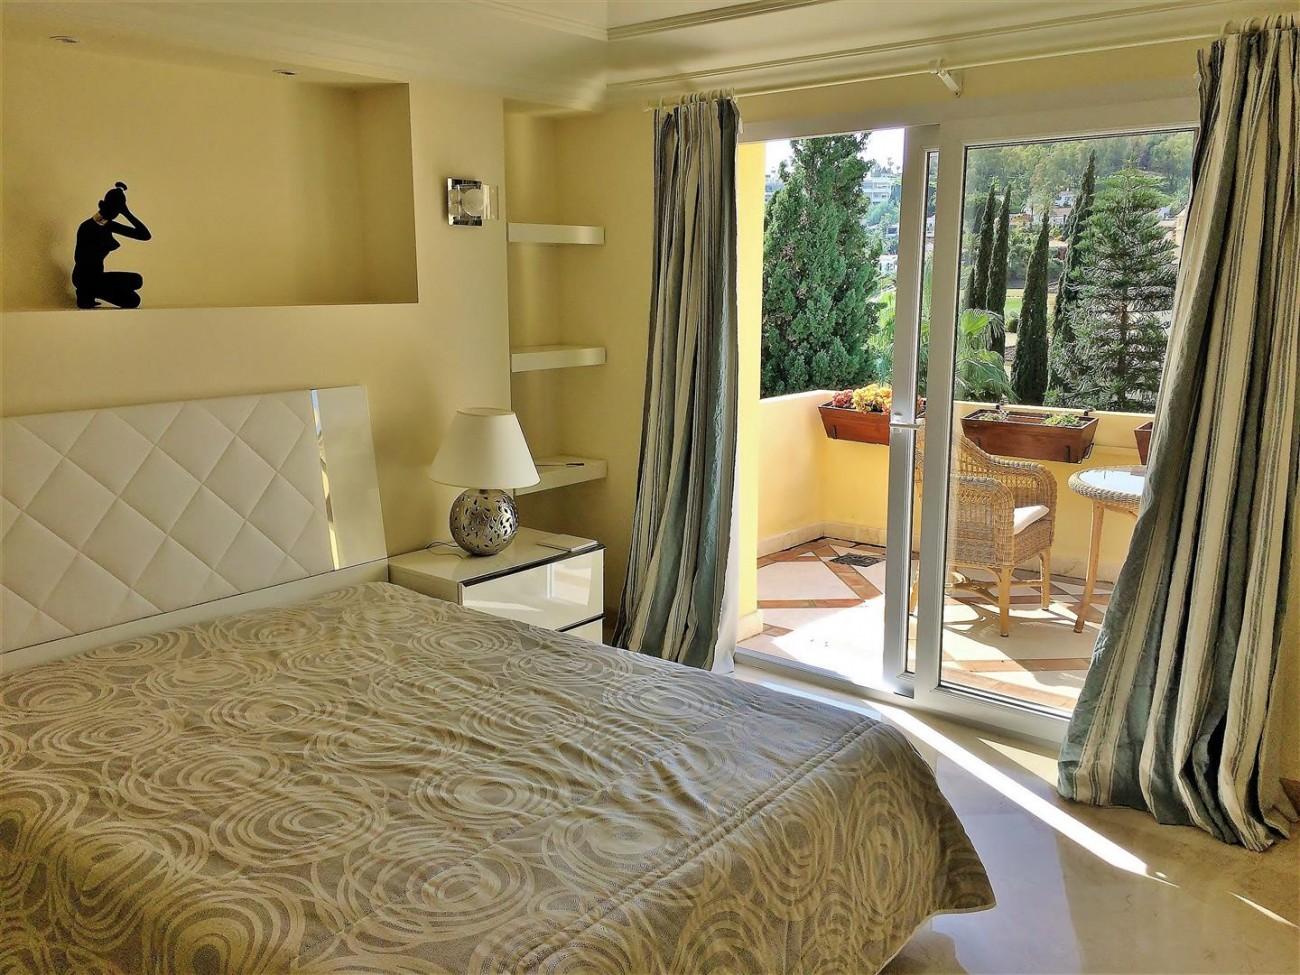 Penthouse for sale Las Alamandas Nueva Andalucia Marbella Spain (33) (Large)